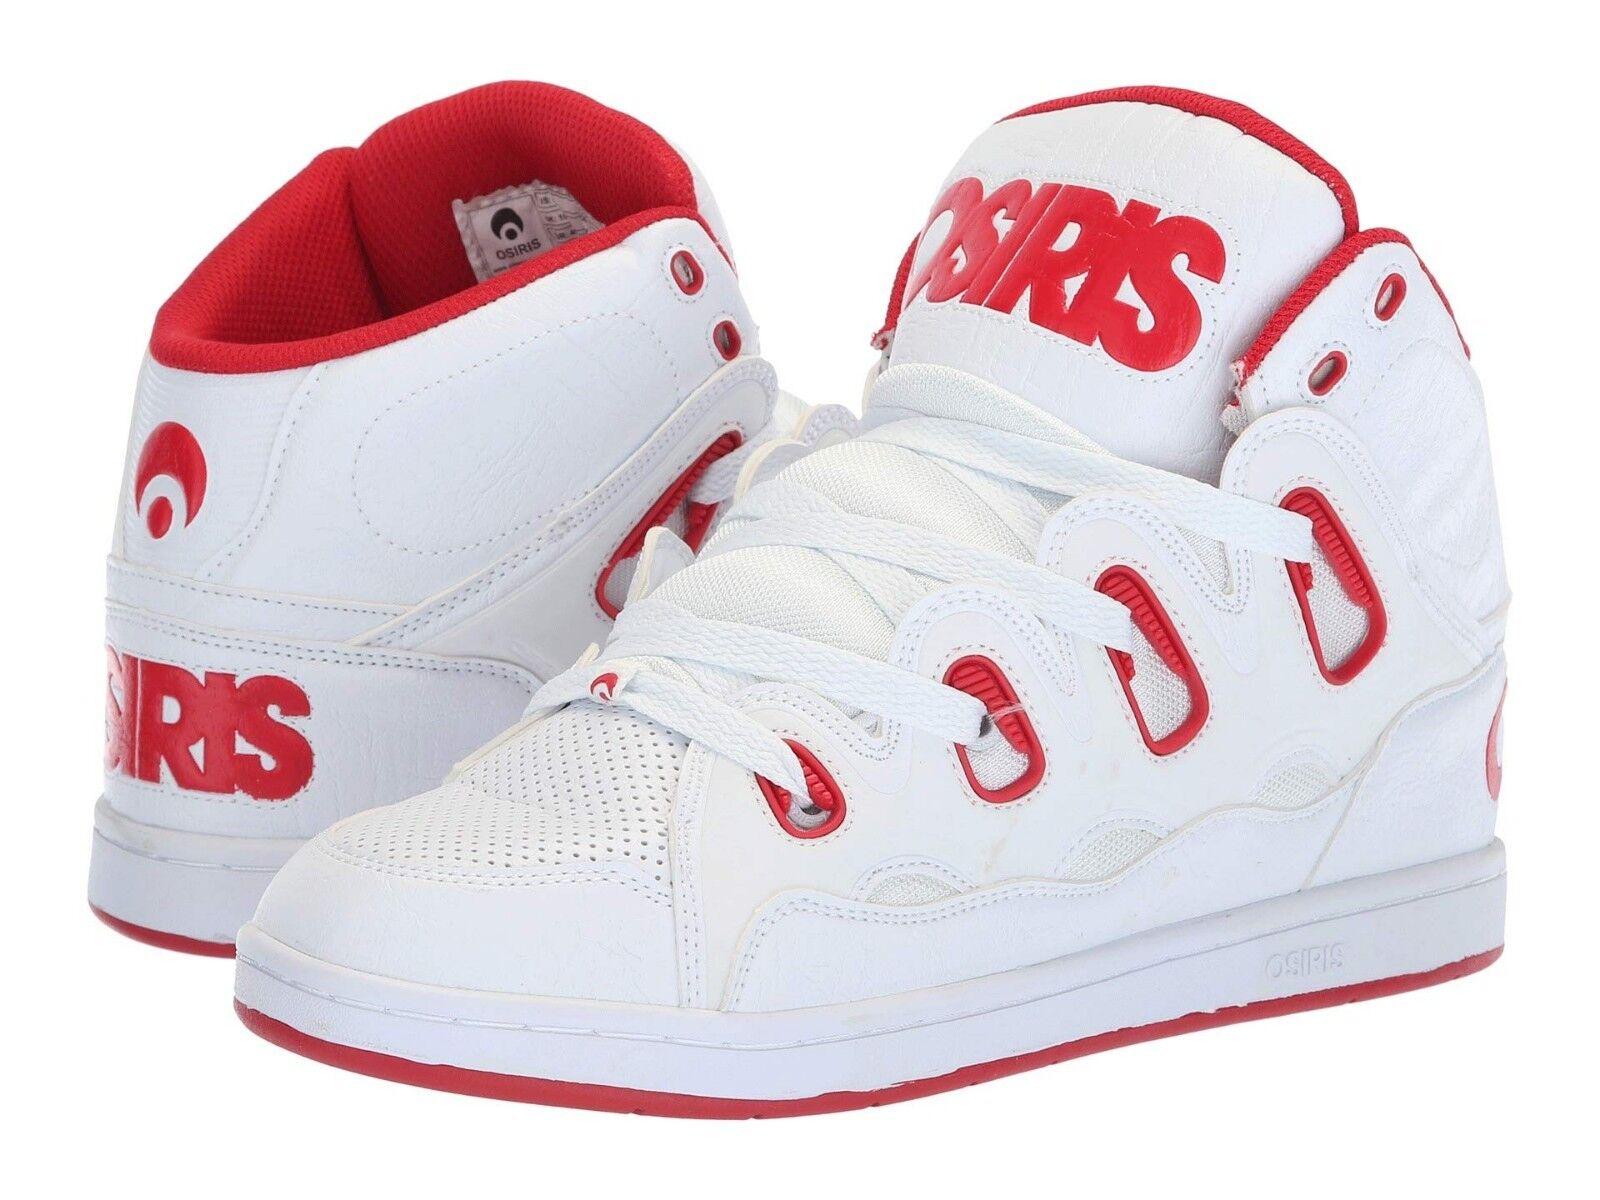 hommes OSIRIS D3H SKATEBOARDING Chaussures NIB blanc rouge blanc